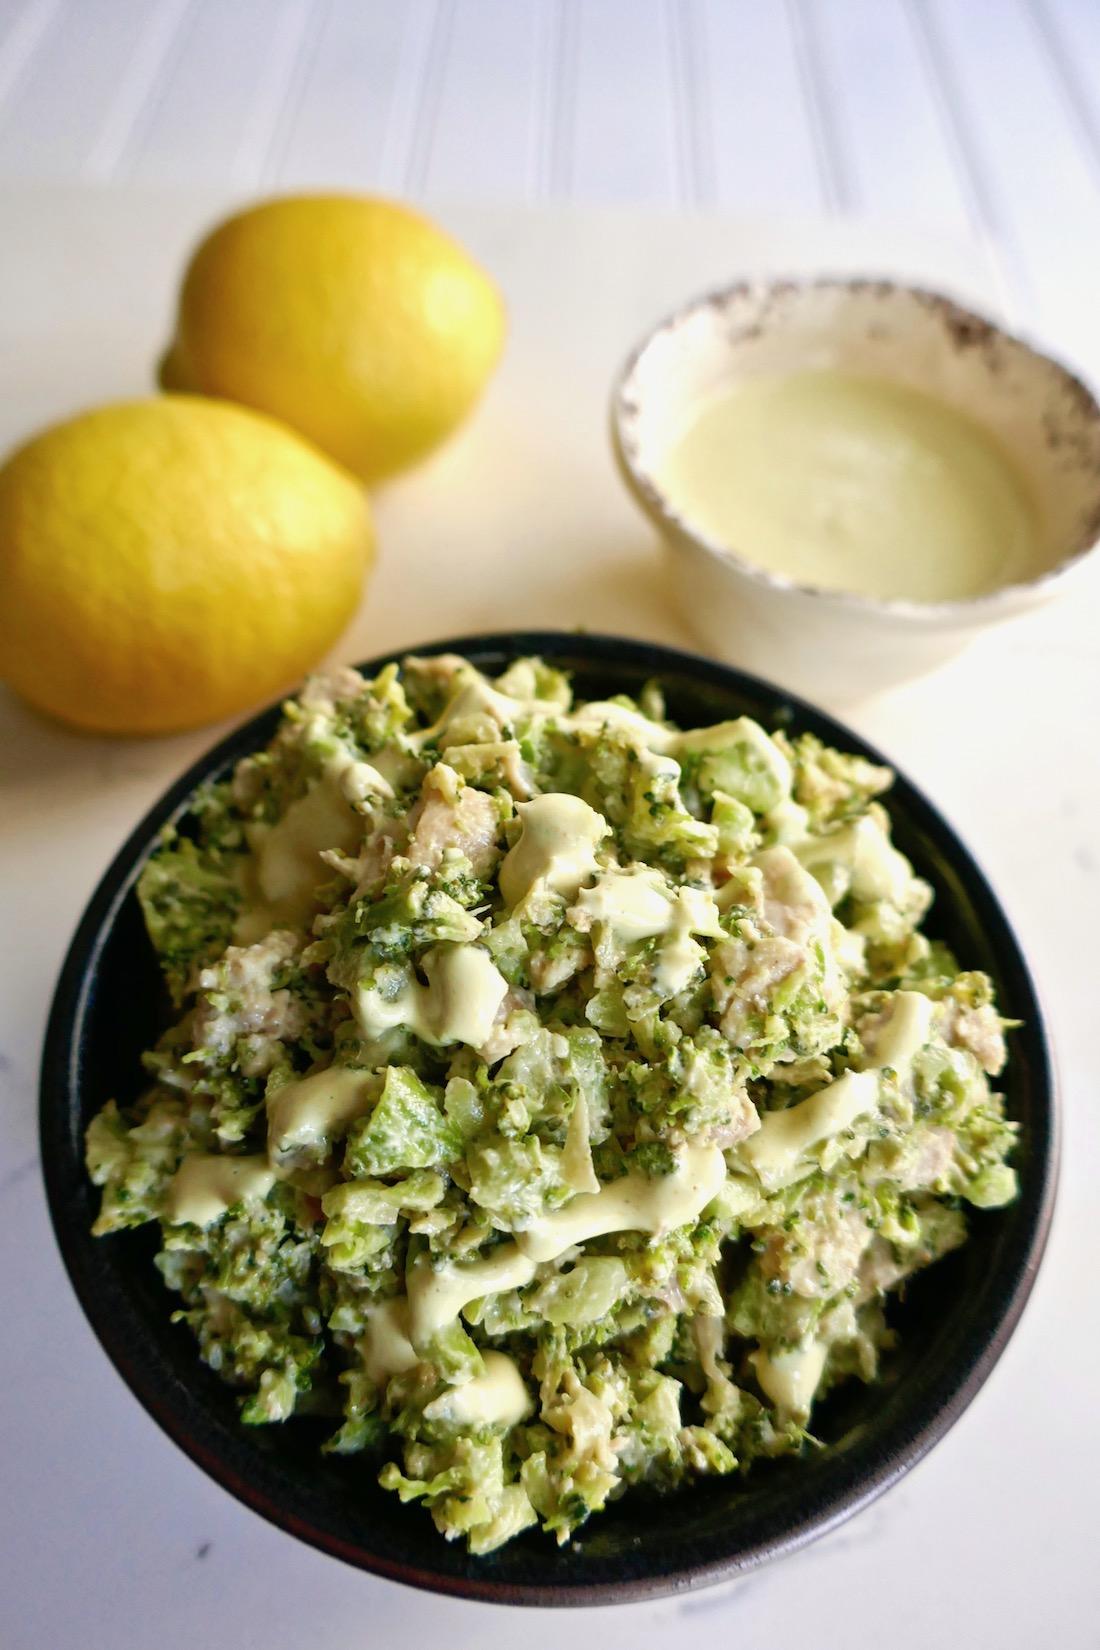 Curry broccoli chicken slaw